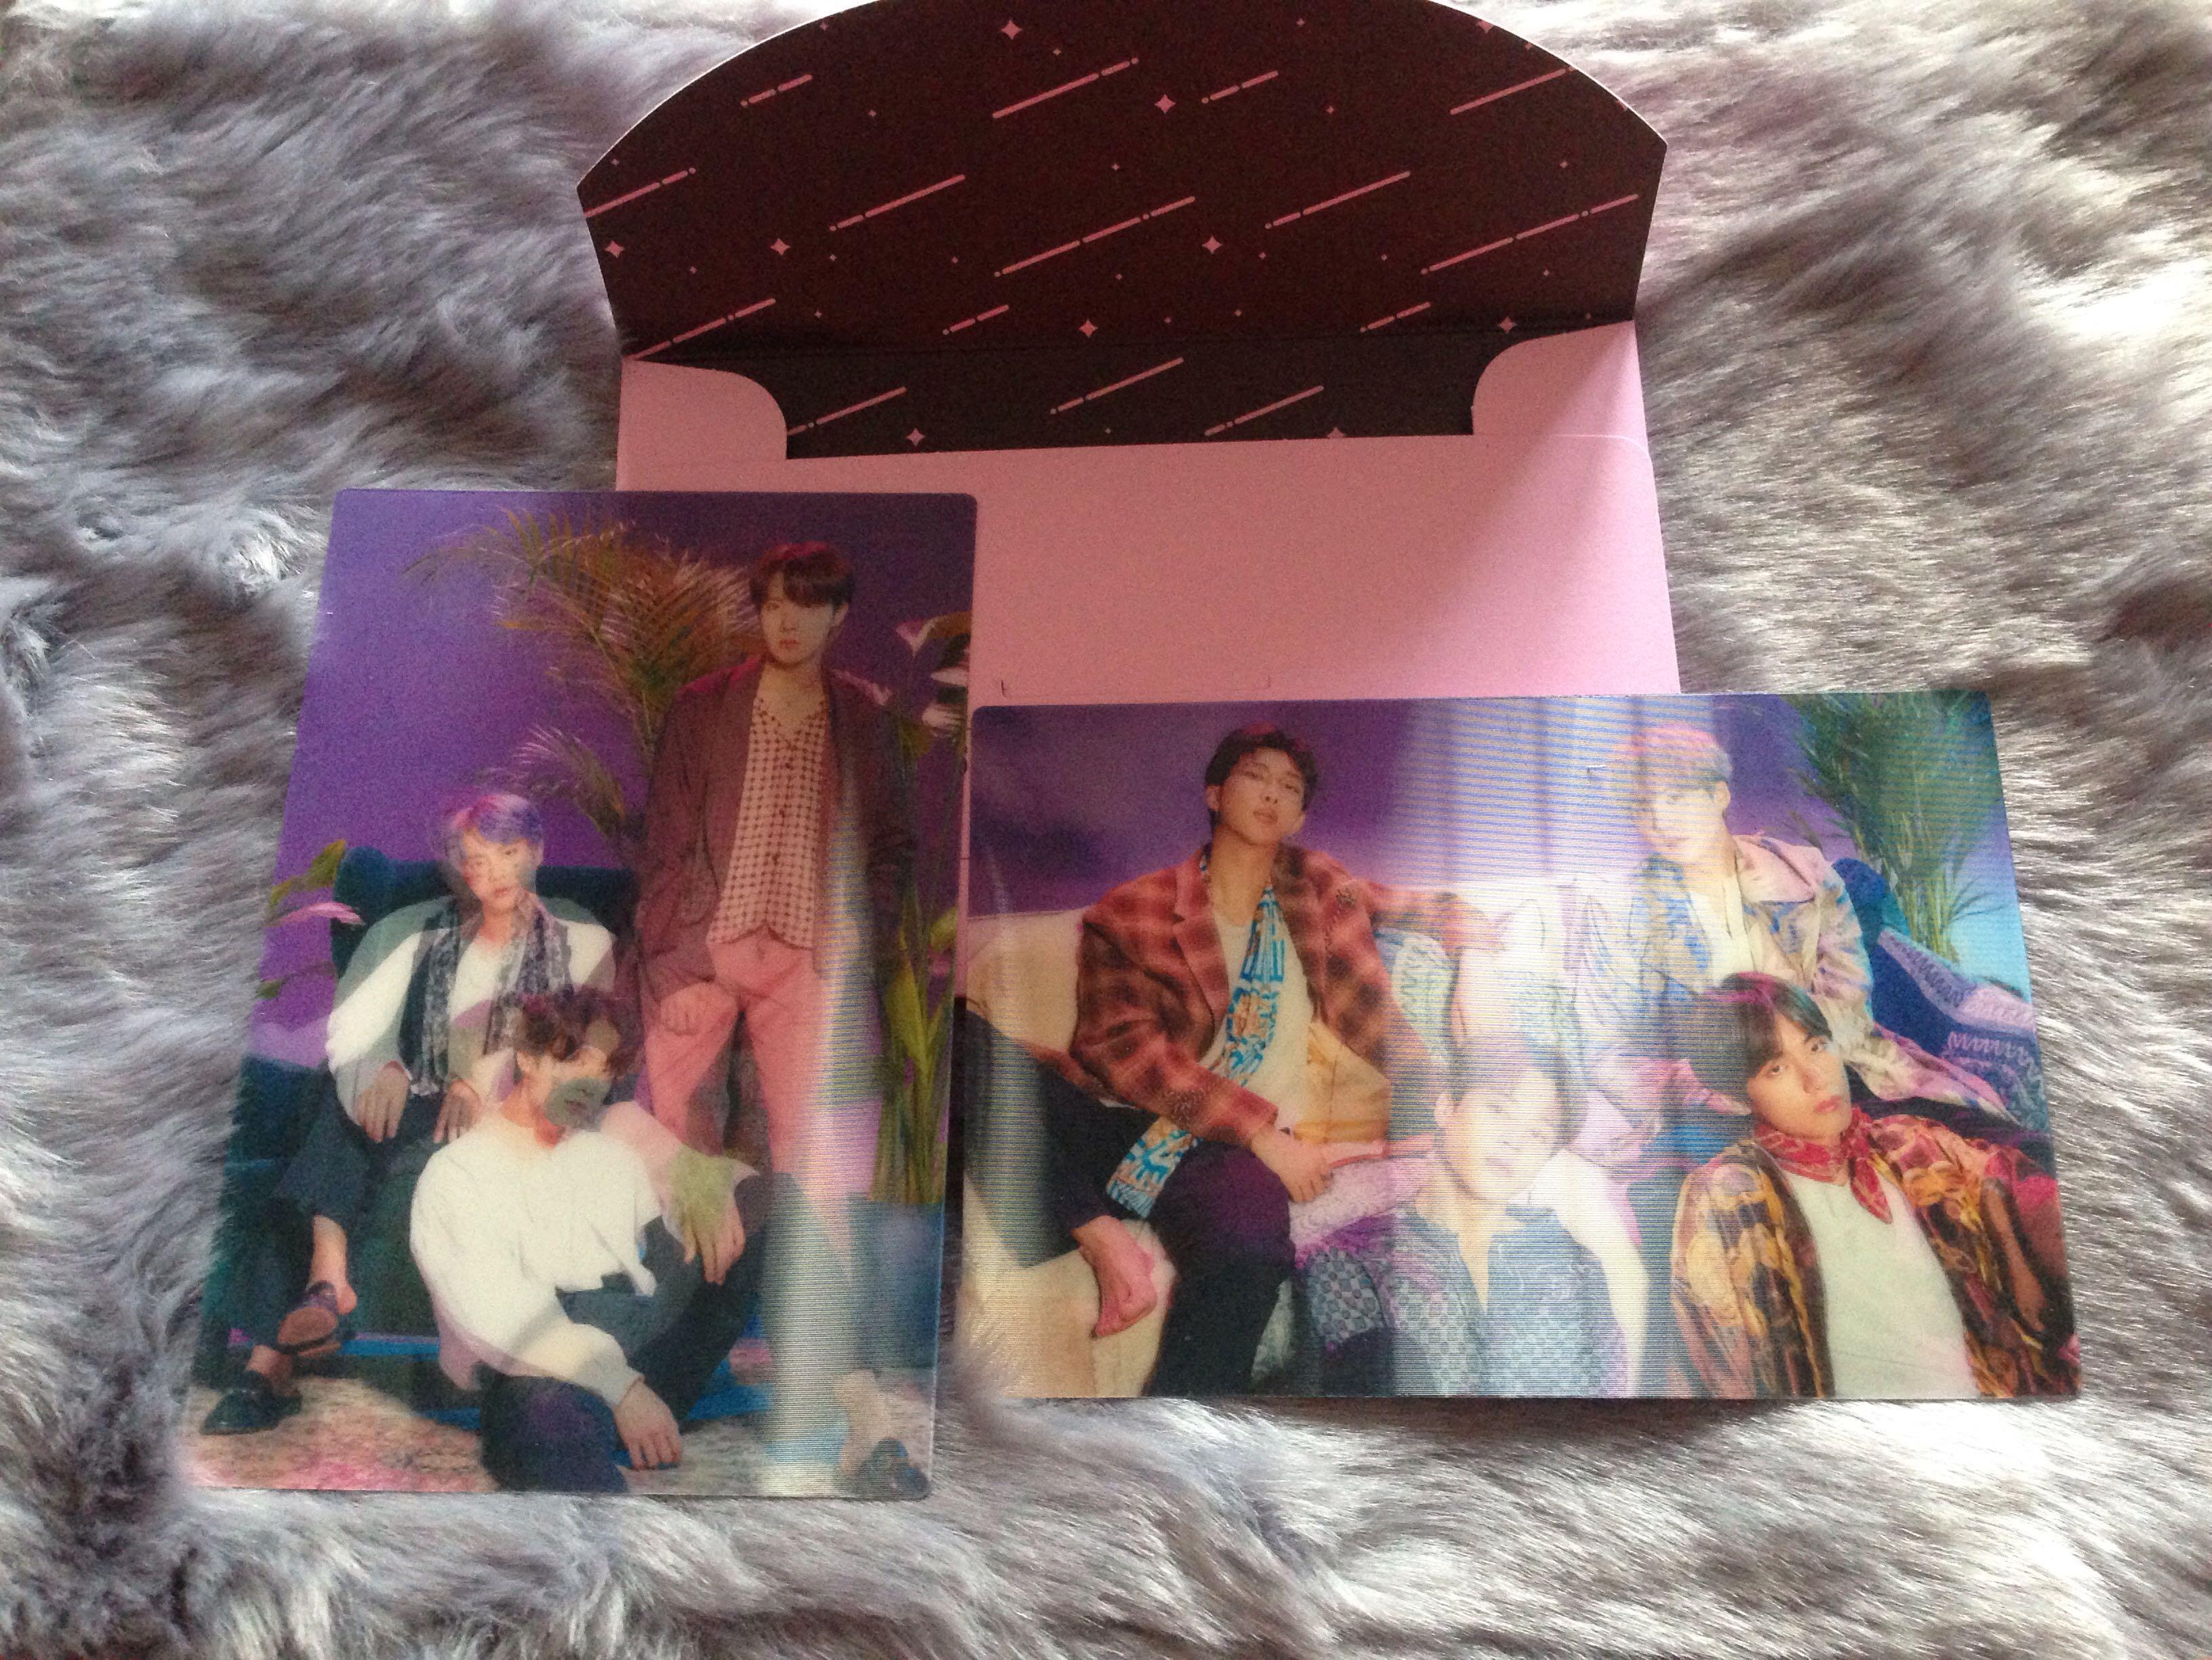 [Loose] BTS 5th Muster Japan MD (Lenticular Postcard Set)